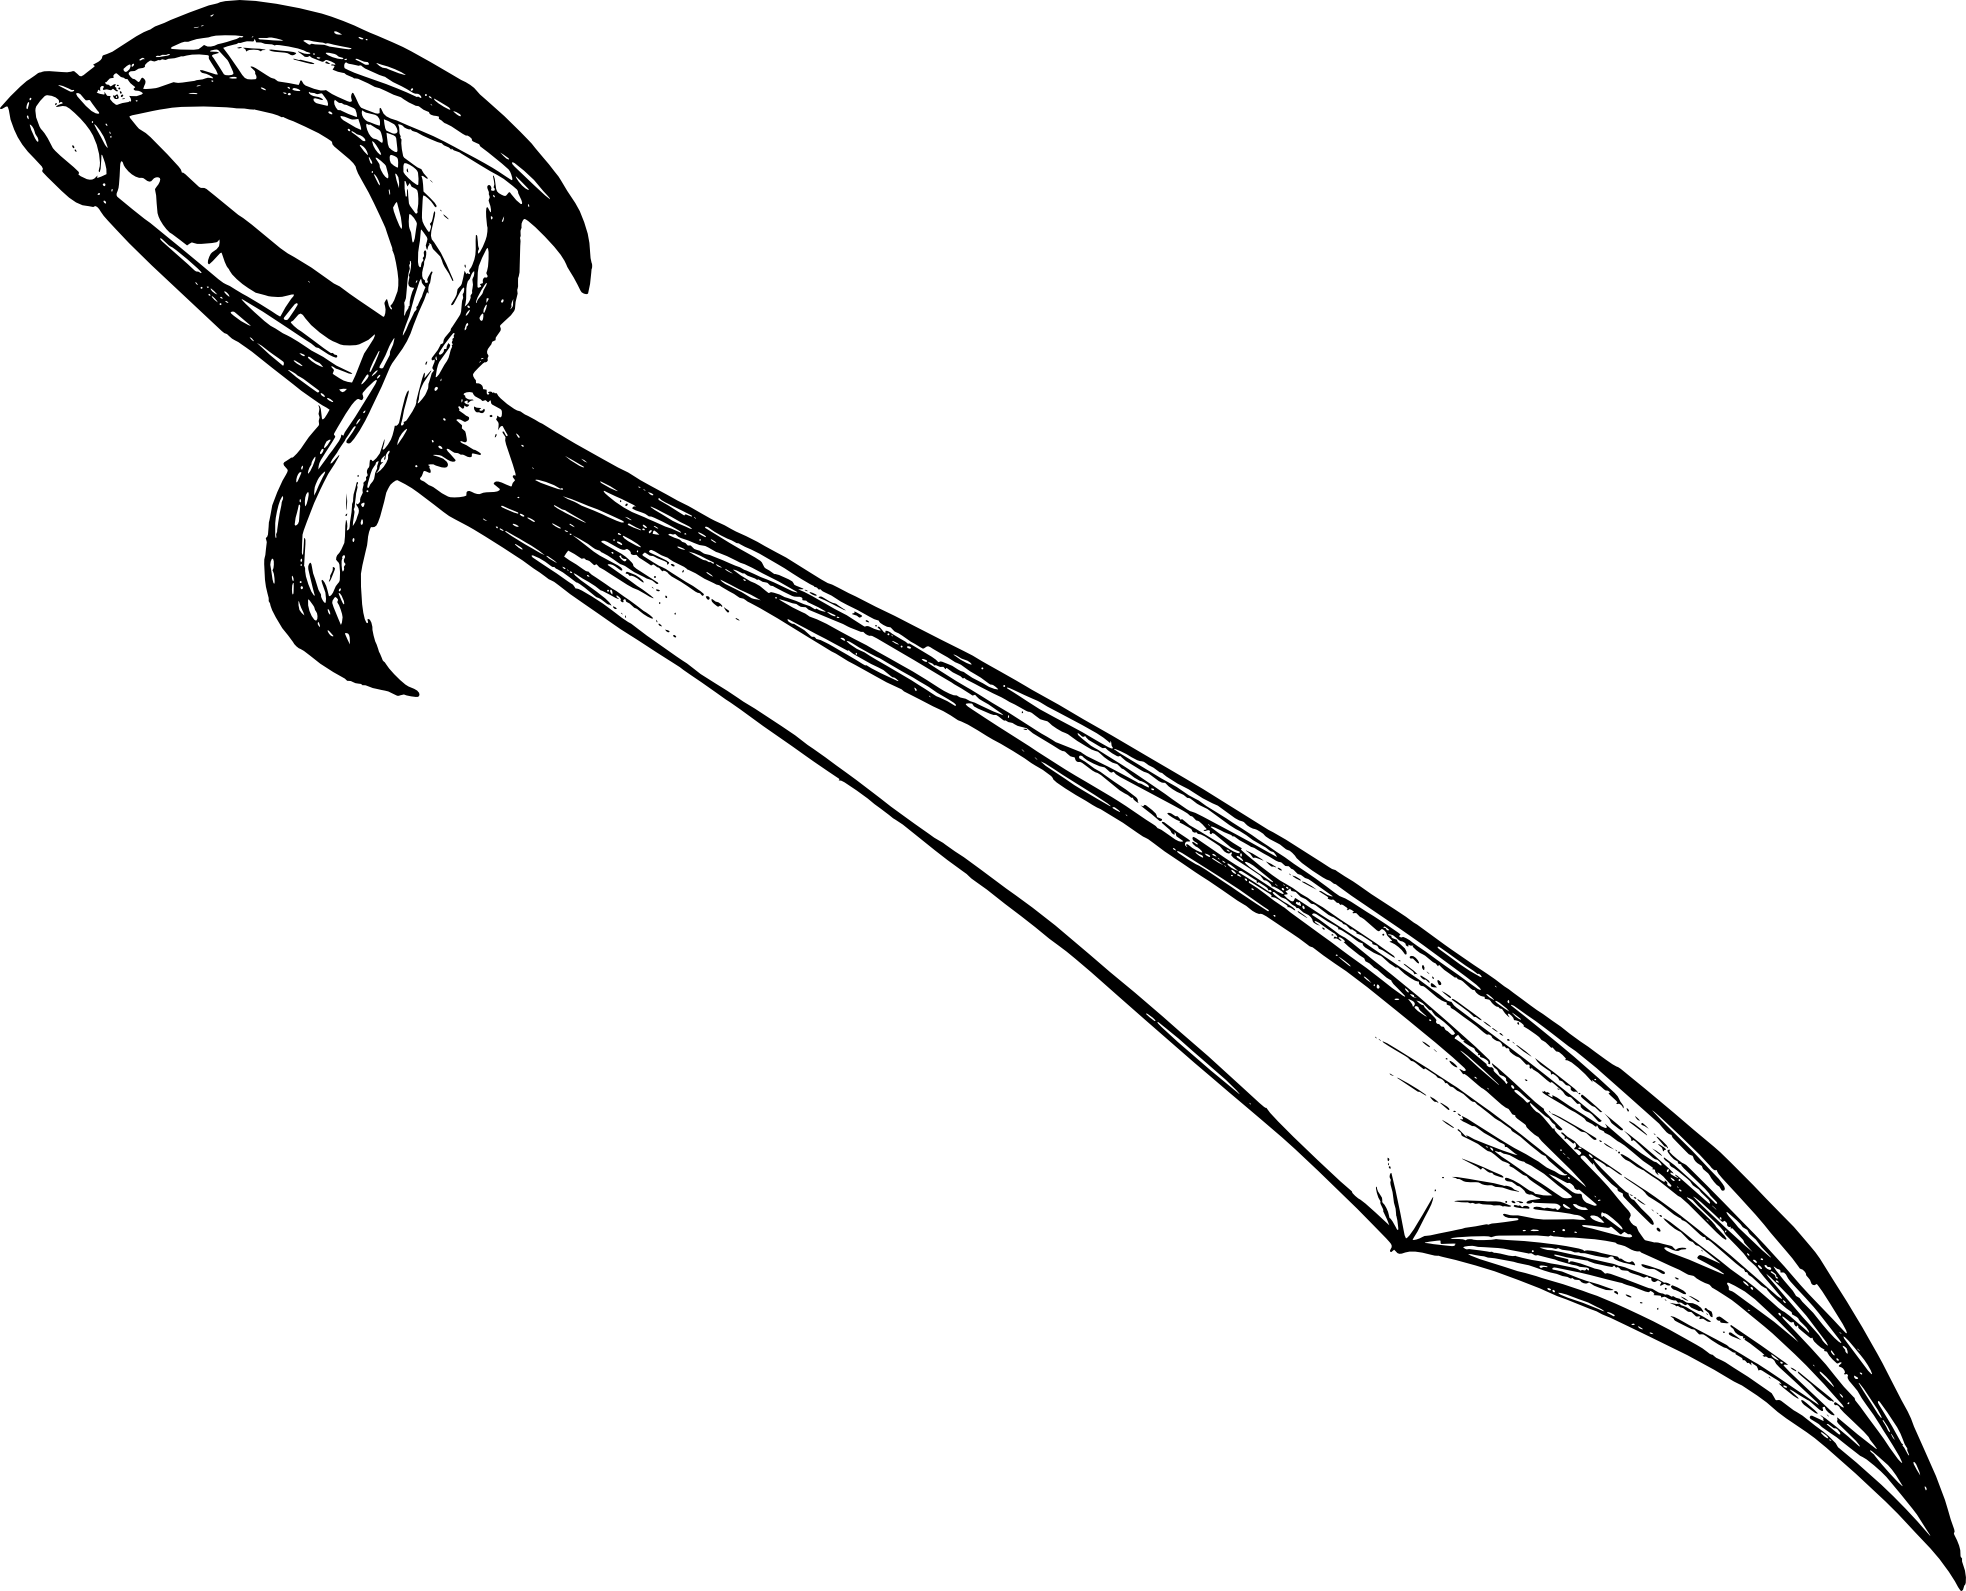 Black Sword Drawing